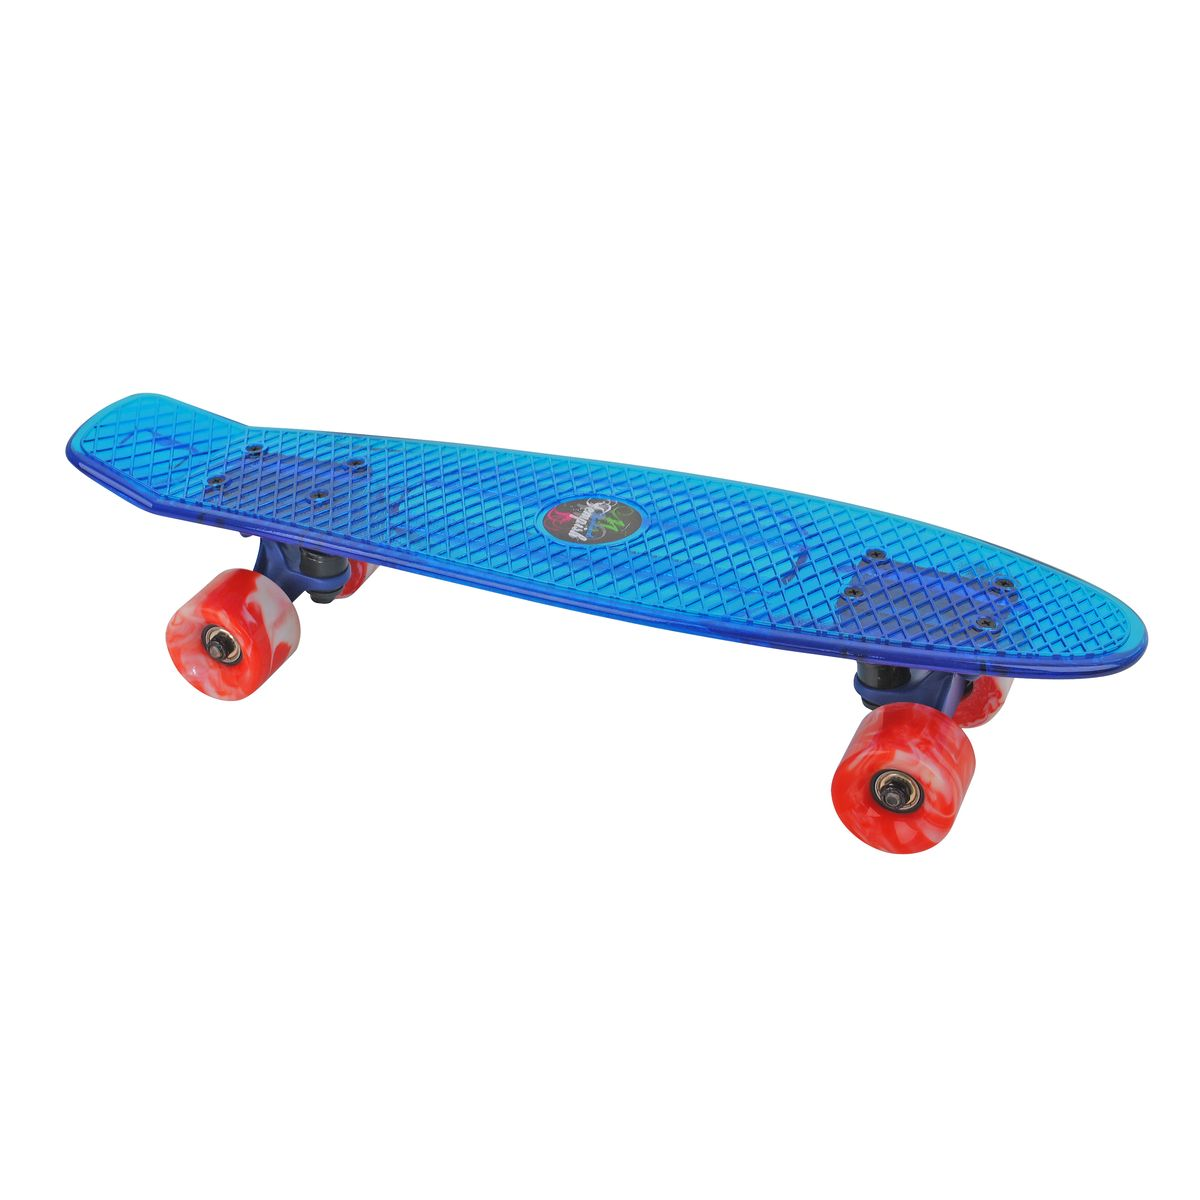 Скейтборд пластиковый Tempish Retro Buffy Star, цвет: голубой050711Пени борд Tempish Buffy нагрузка до 100 кг